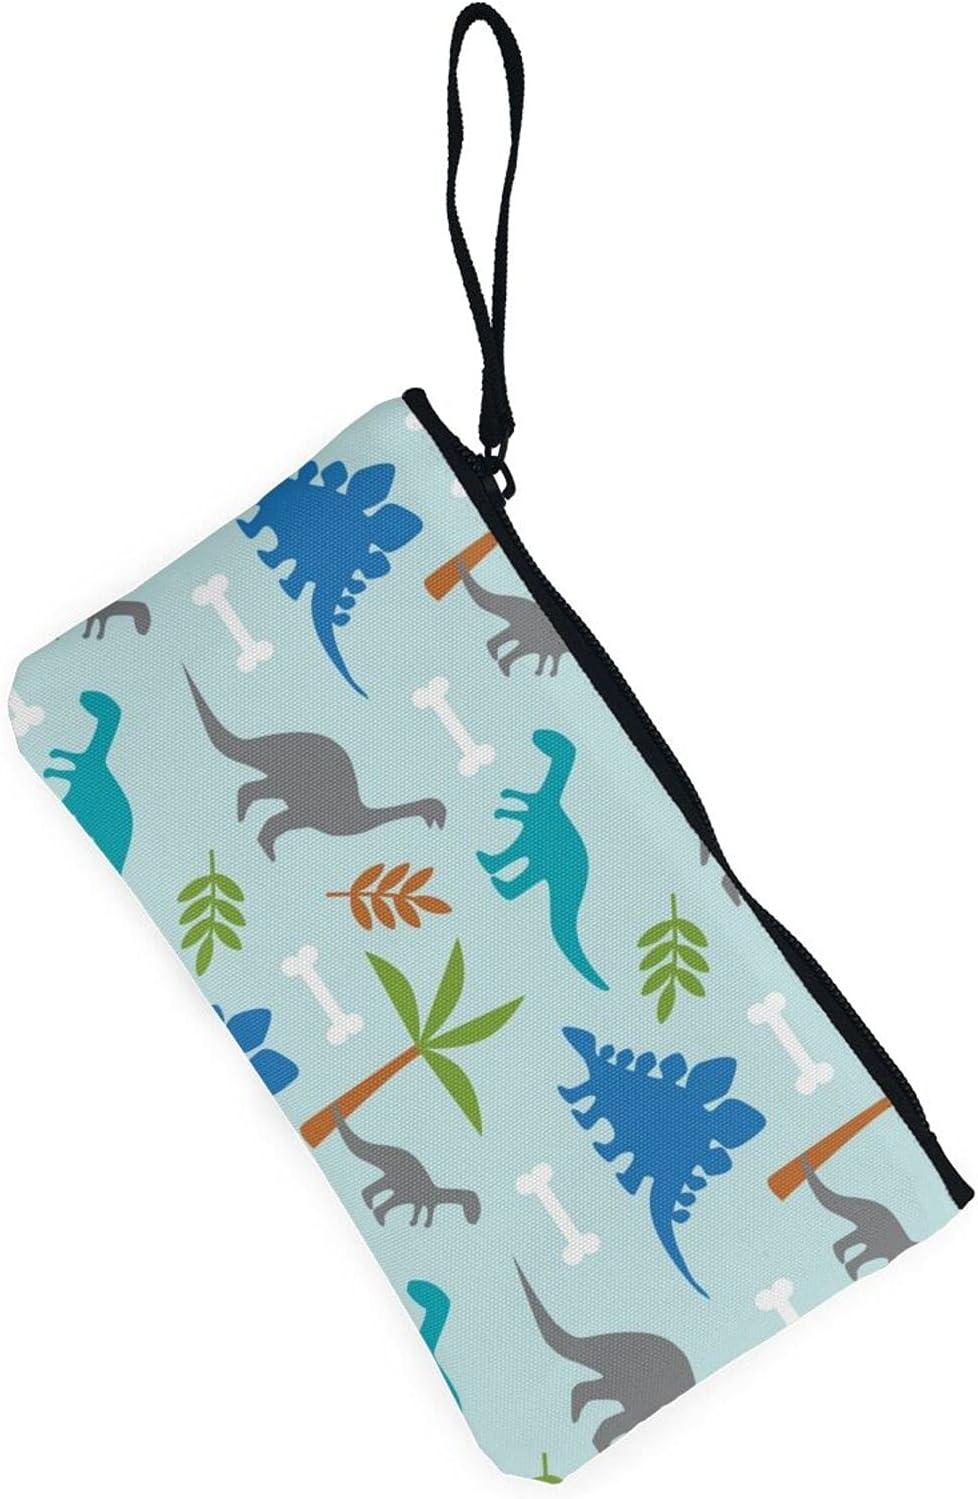 AORRUAM Dinosaur and palm tree Canvas Coin Purse,Canvas Zipper Pencil Cases,Canvas Change Purse Pouch Mini Wallet Coin Bag